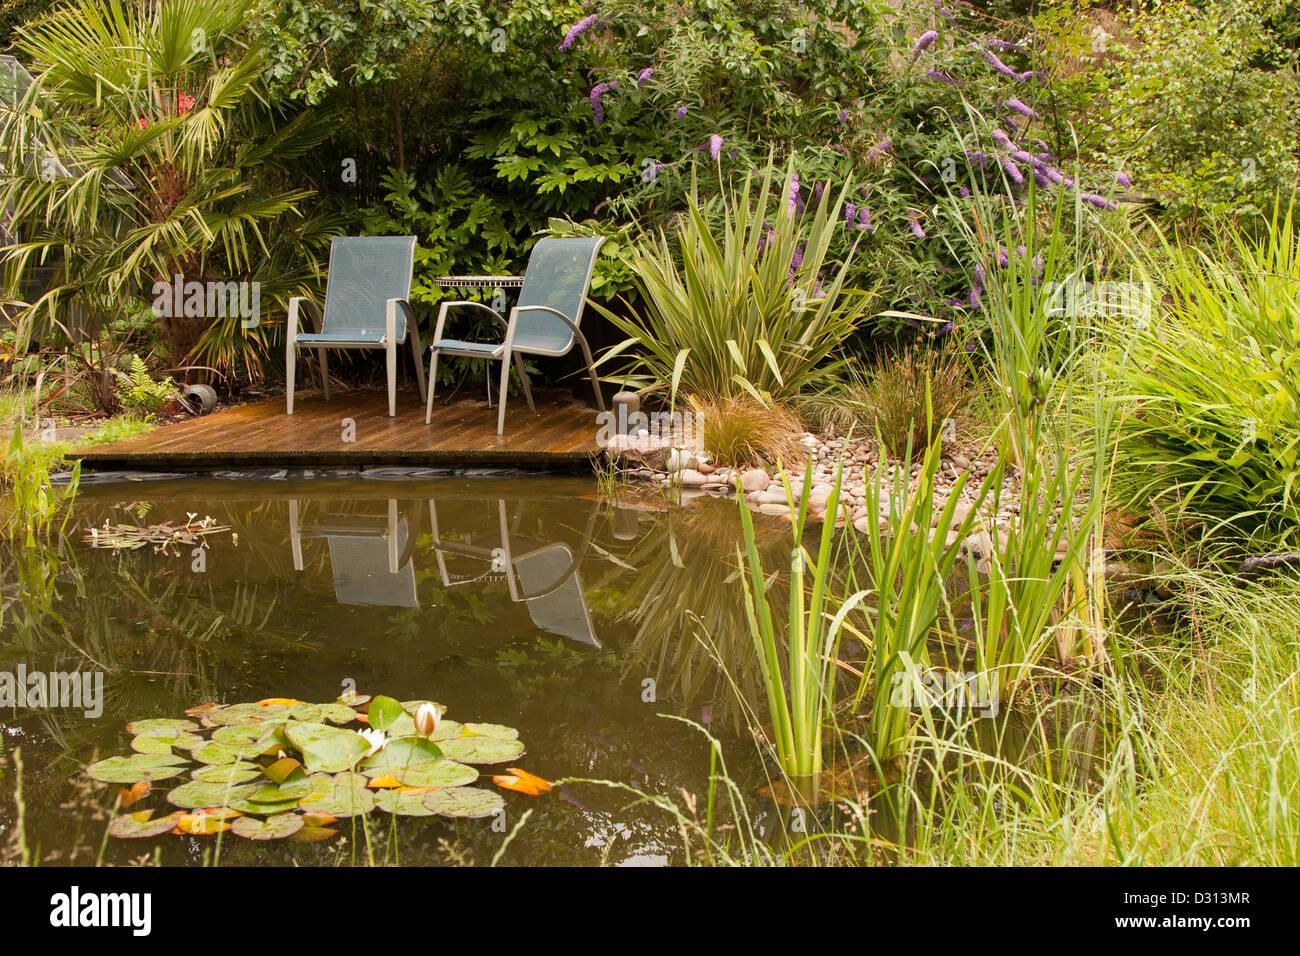 Garden seating on wooden decking, overlooking wildlife pond, England ...